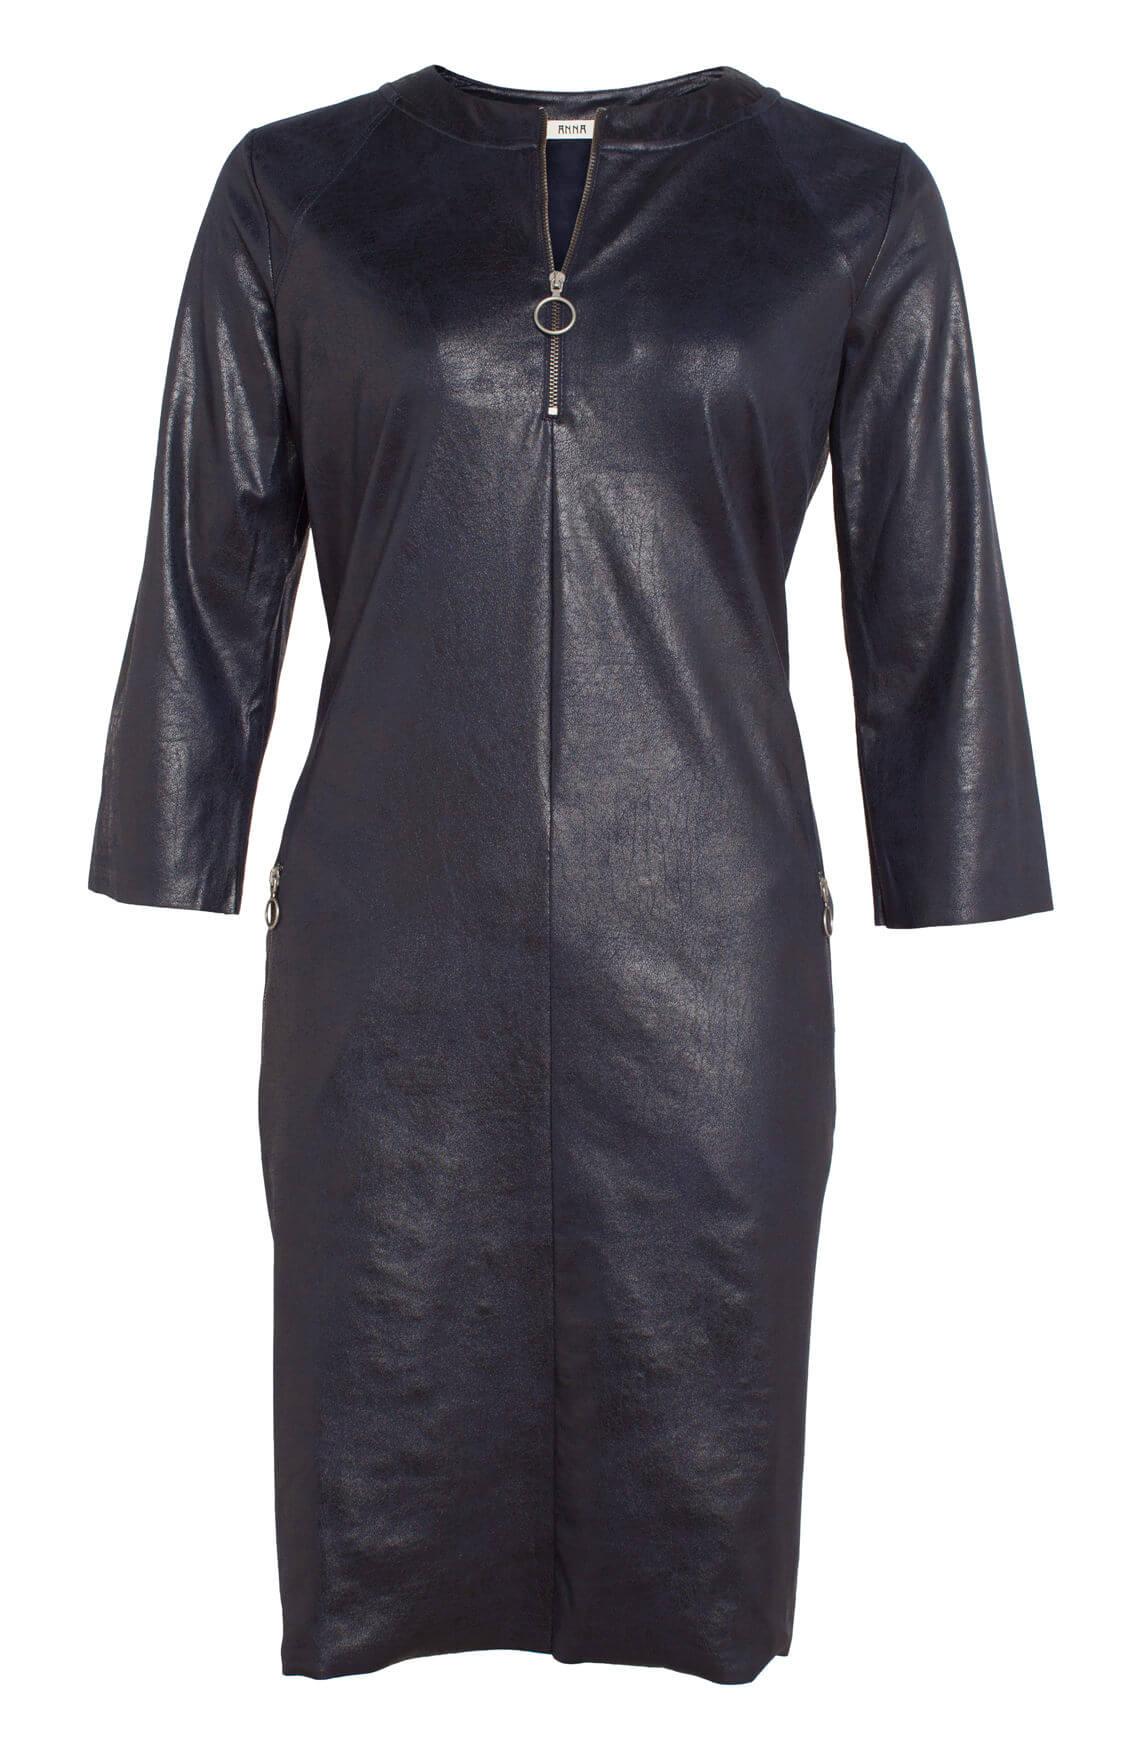 Anna Dames Fake leather jurk Blauw